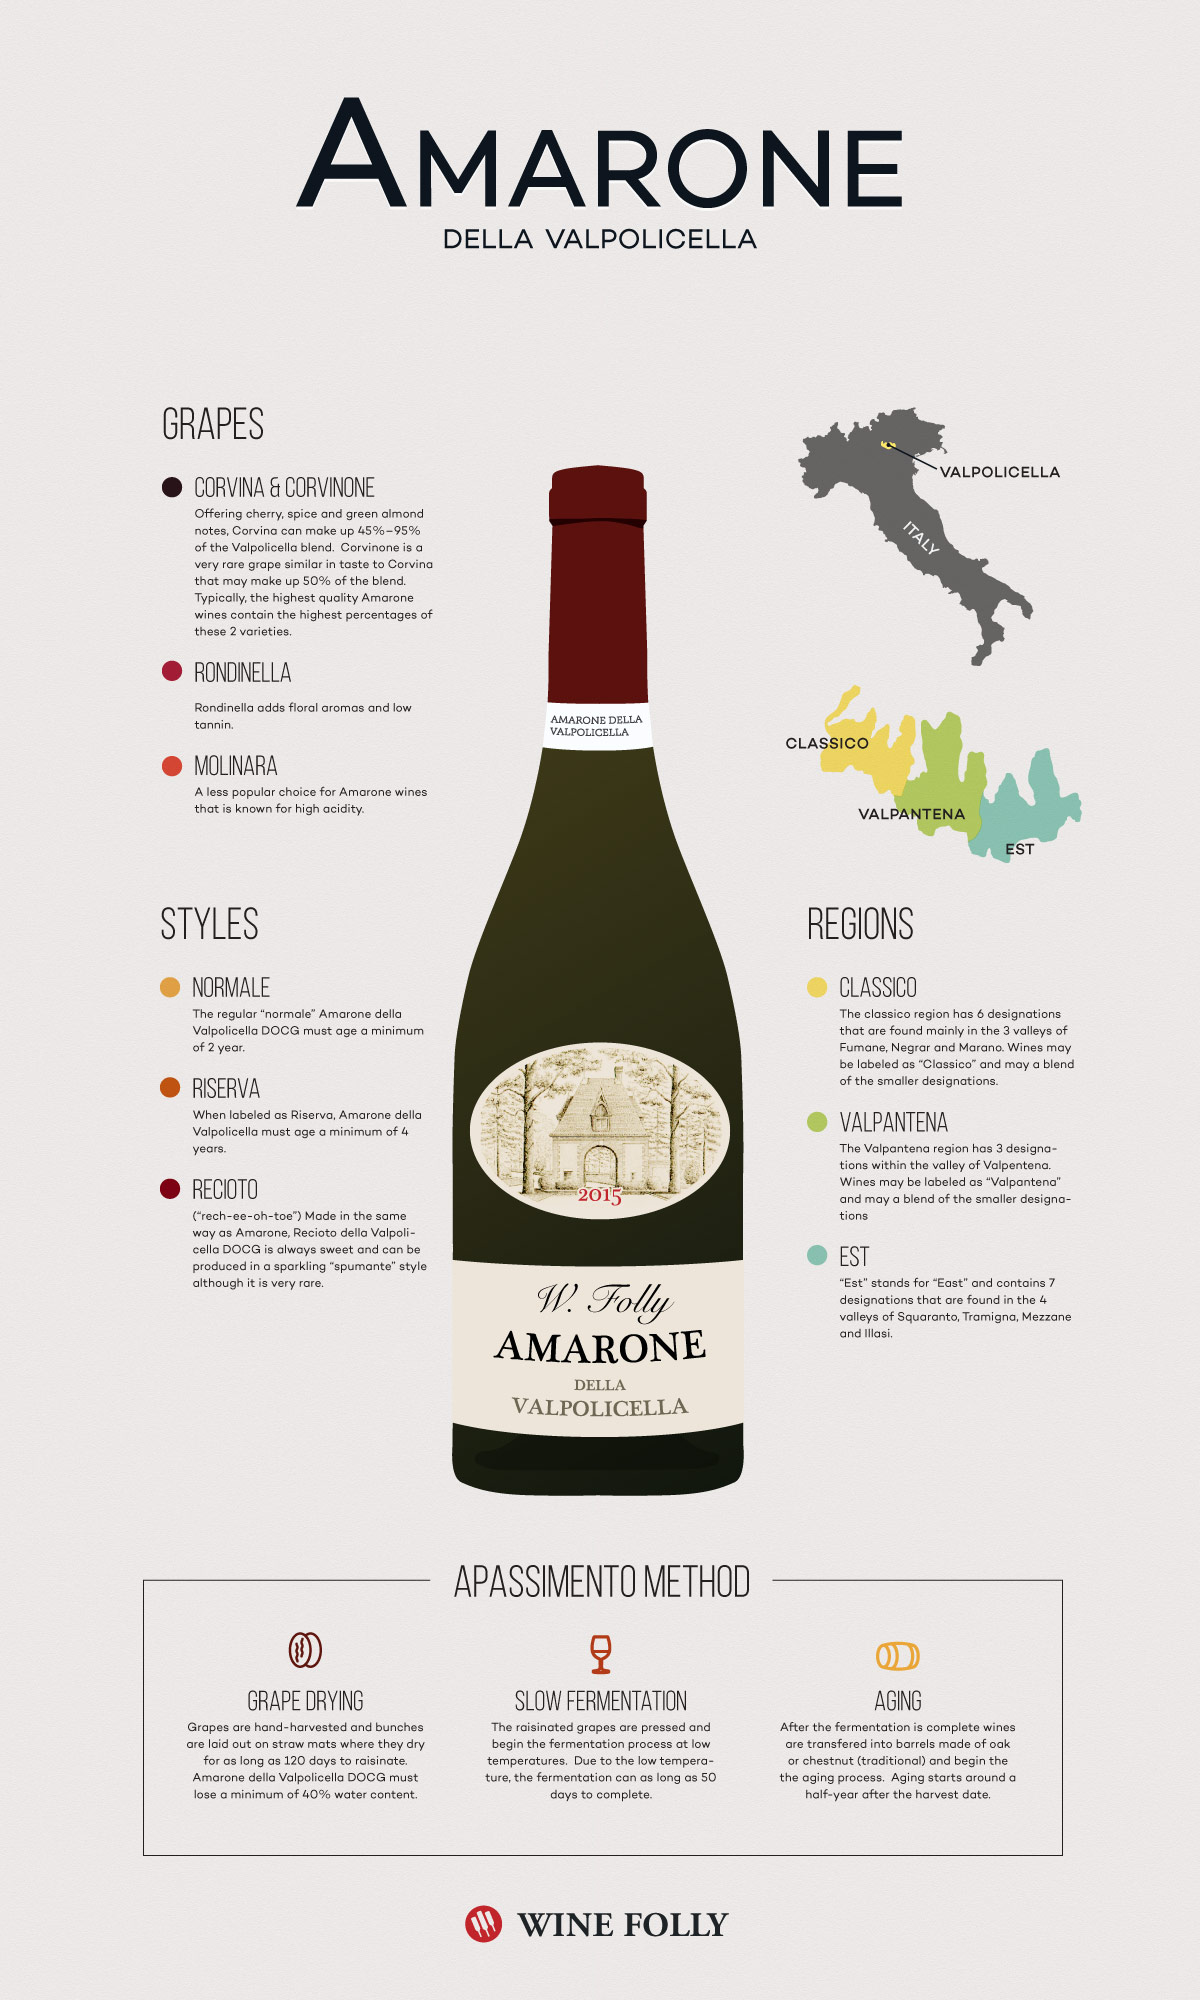 Amarone wine guide by Wine Folly